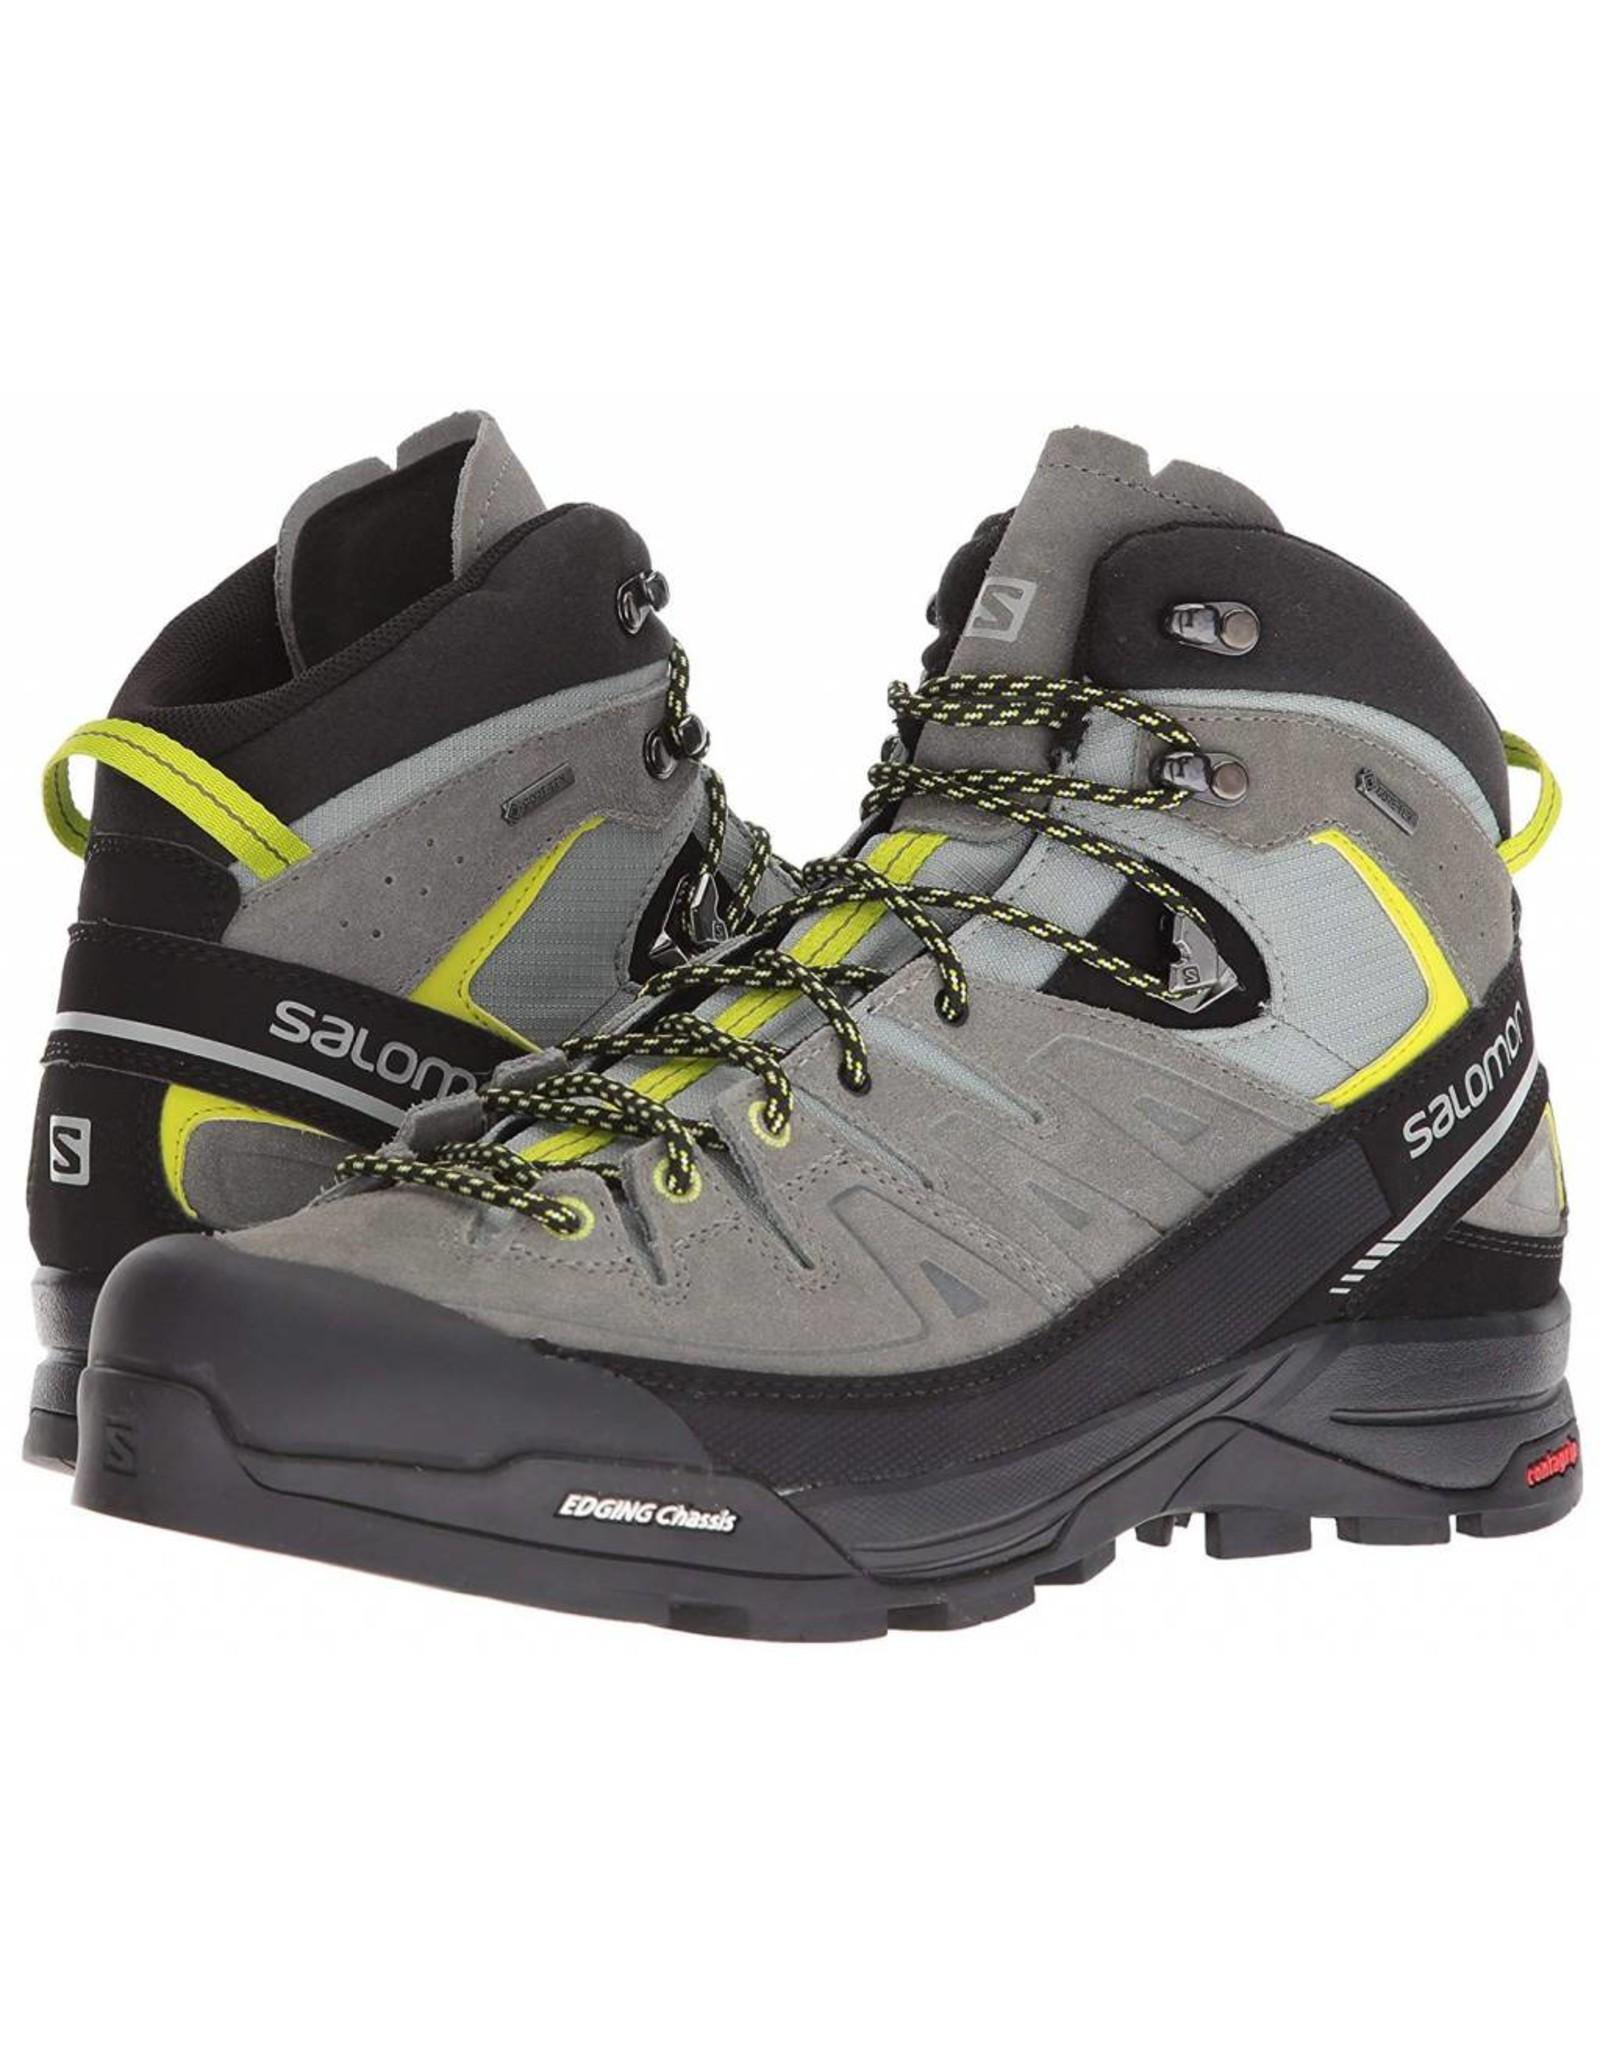 Salomon Salomon XAlp Mid LTR GTX Men's Boot